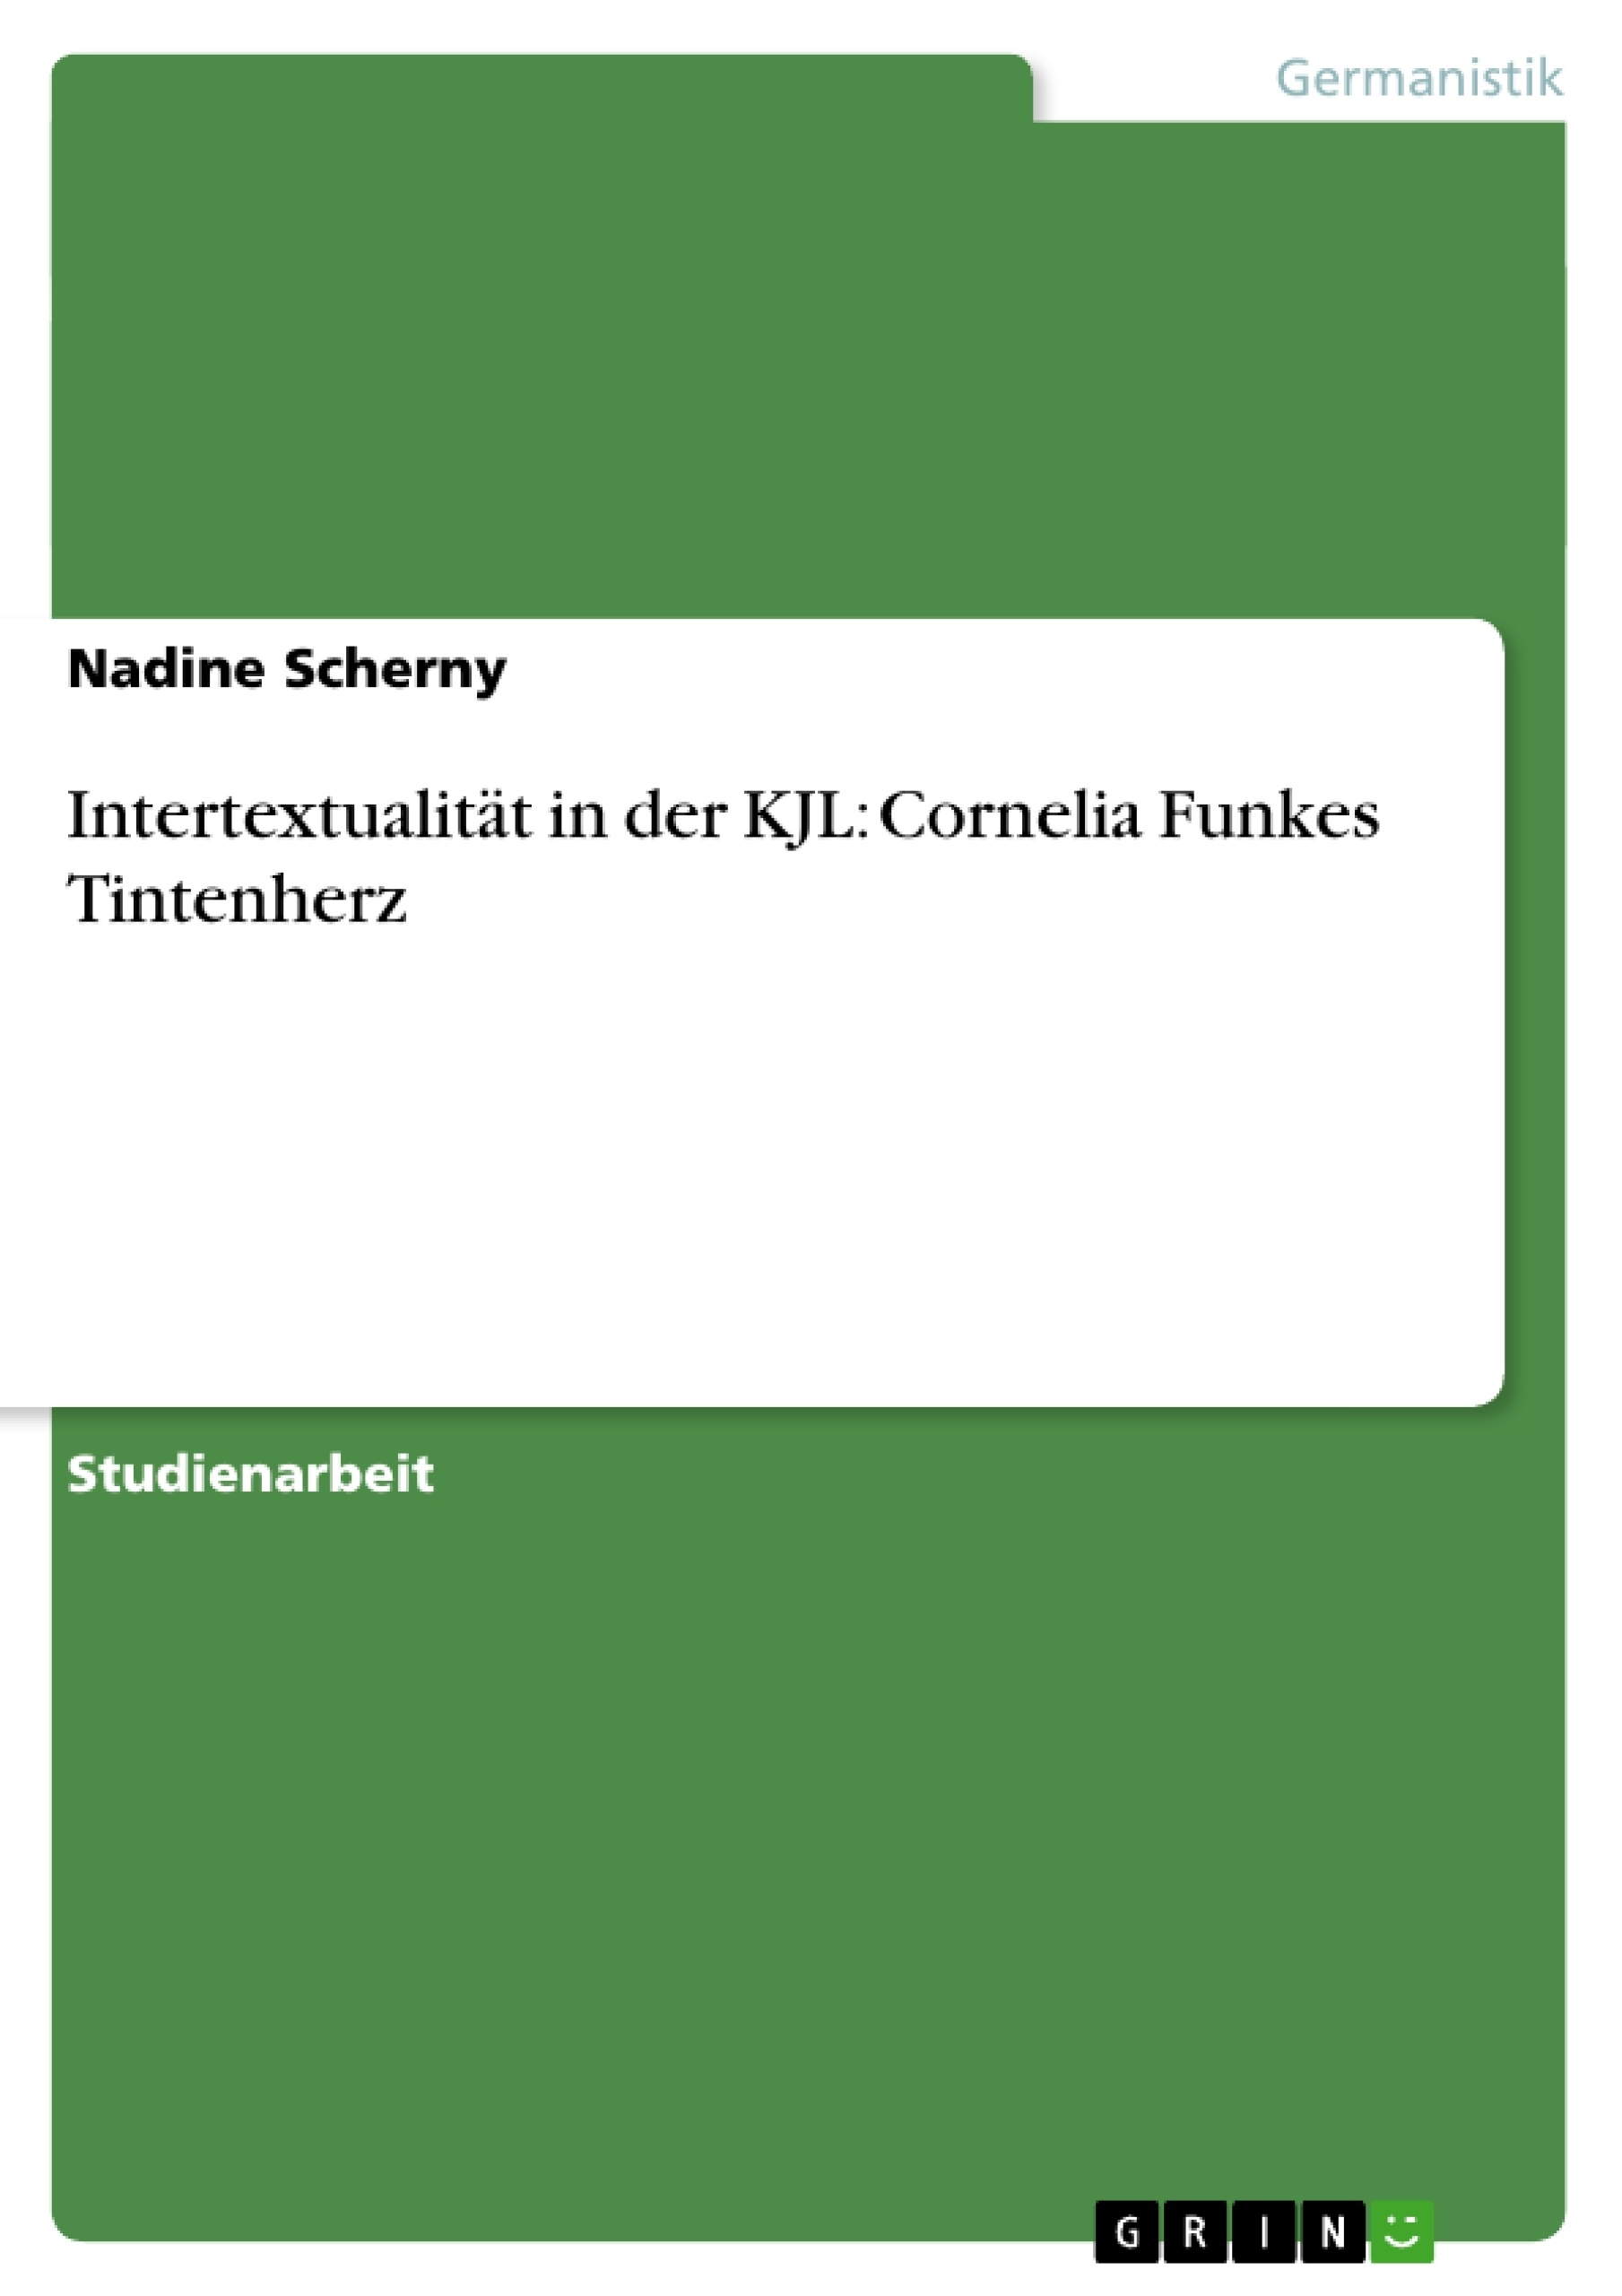 Titel: Intertextualität in der KJL: Cornelia Funkes Tintenherz